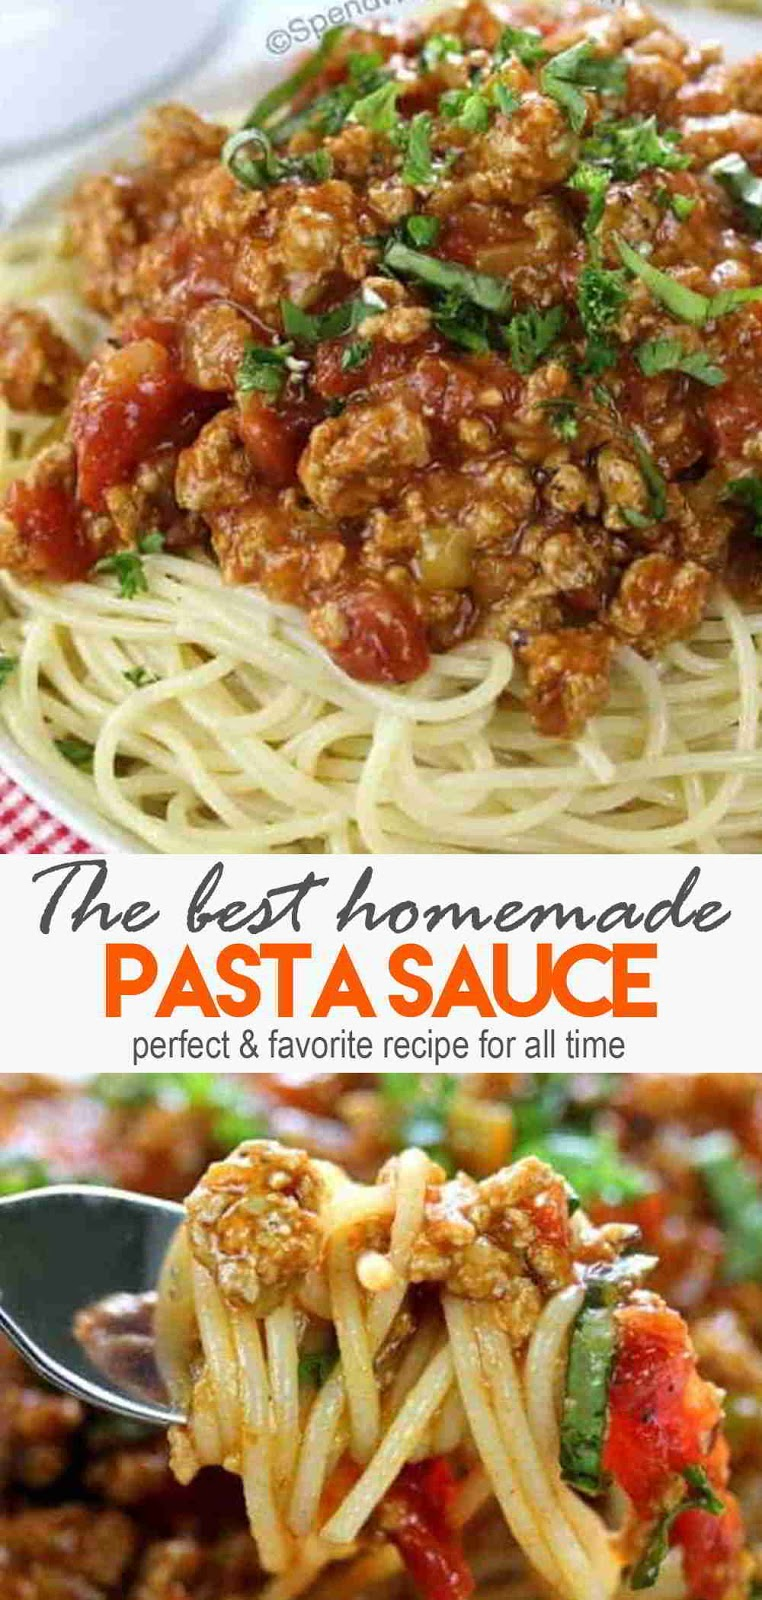 The Best Homemade Pasta Sauce #breakfast #pastarecipes